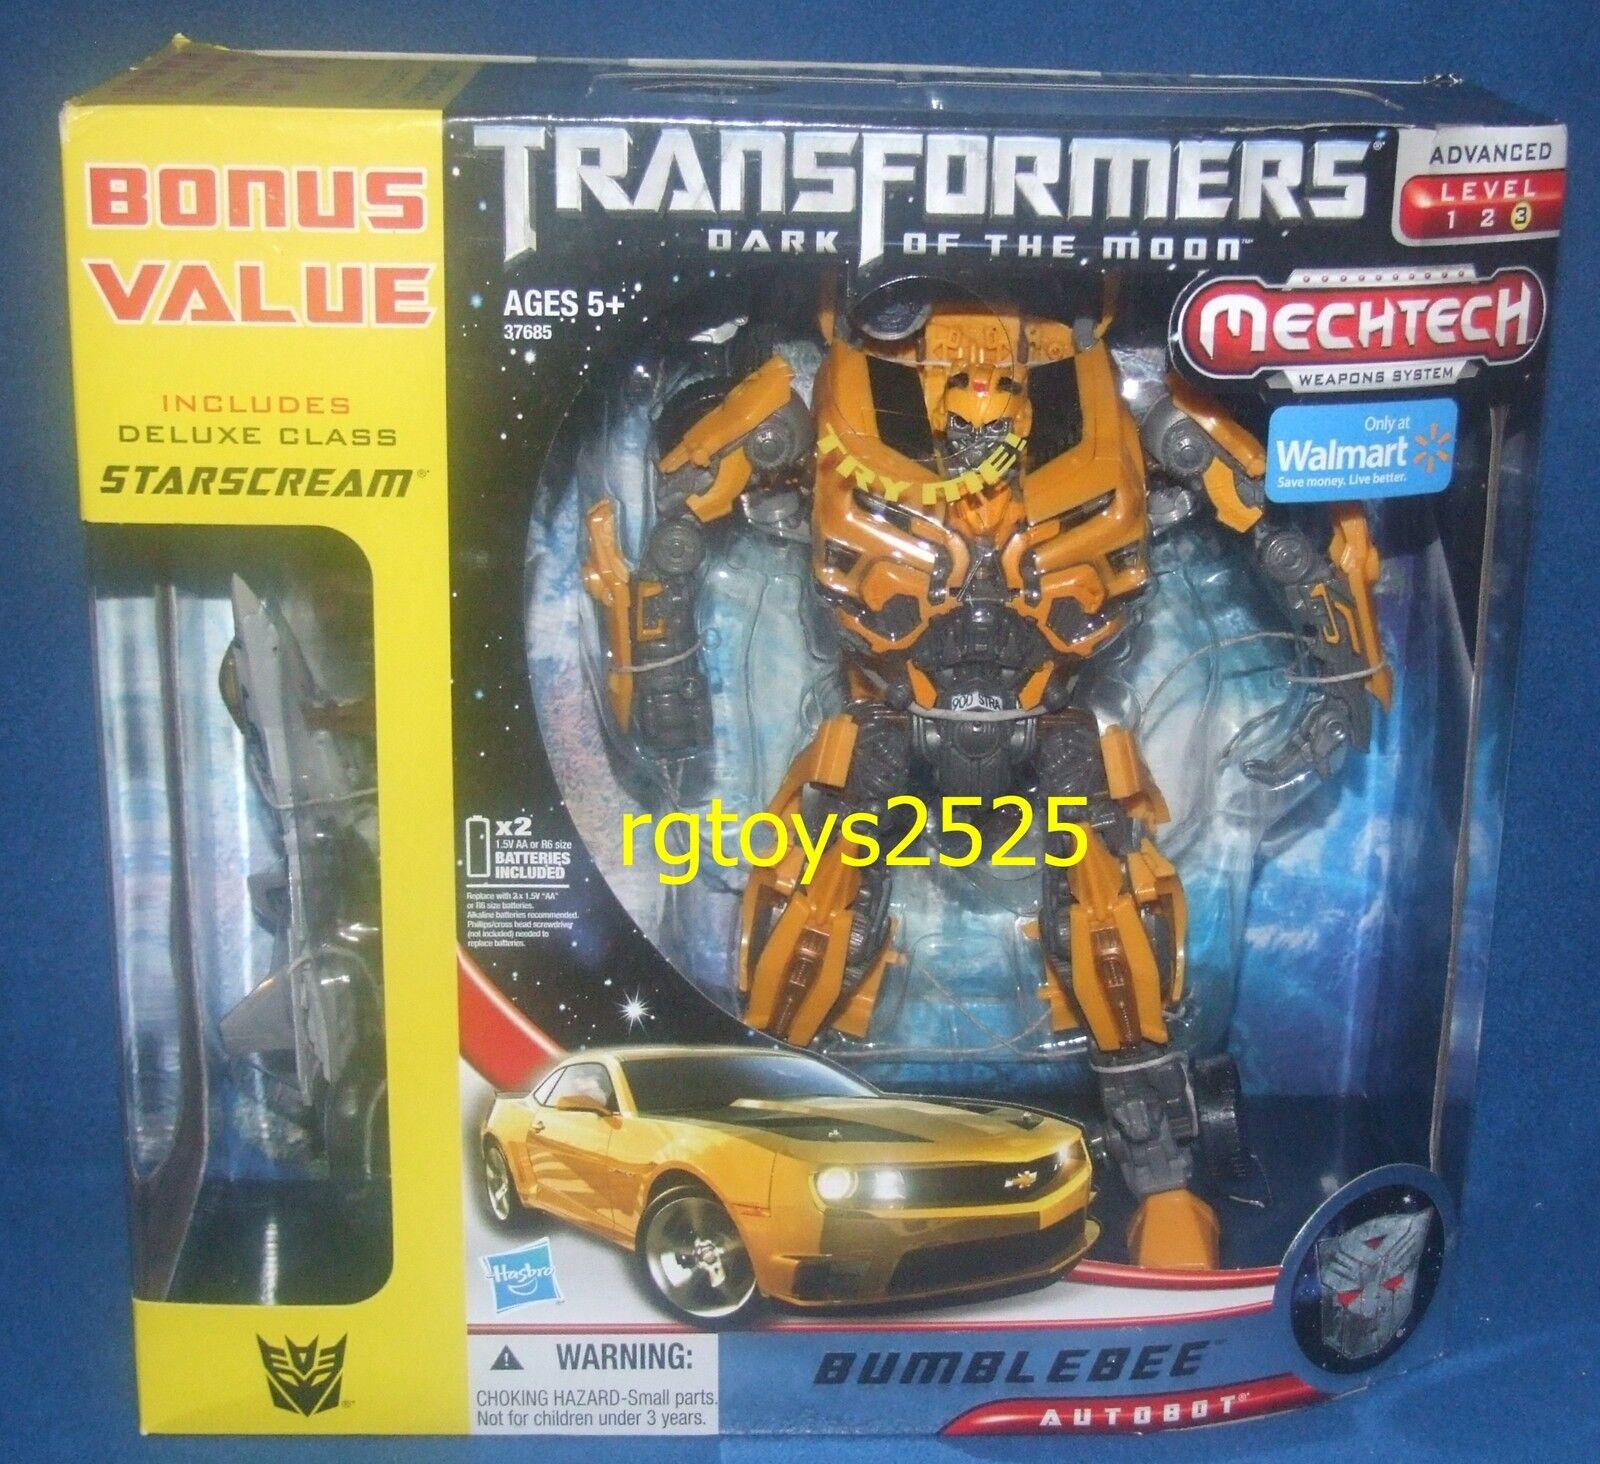 Transformers Dark Of The Moon Leader Class Bumblebee Camaro W Nuevas Starscream